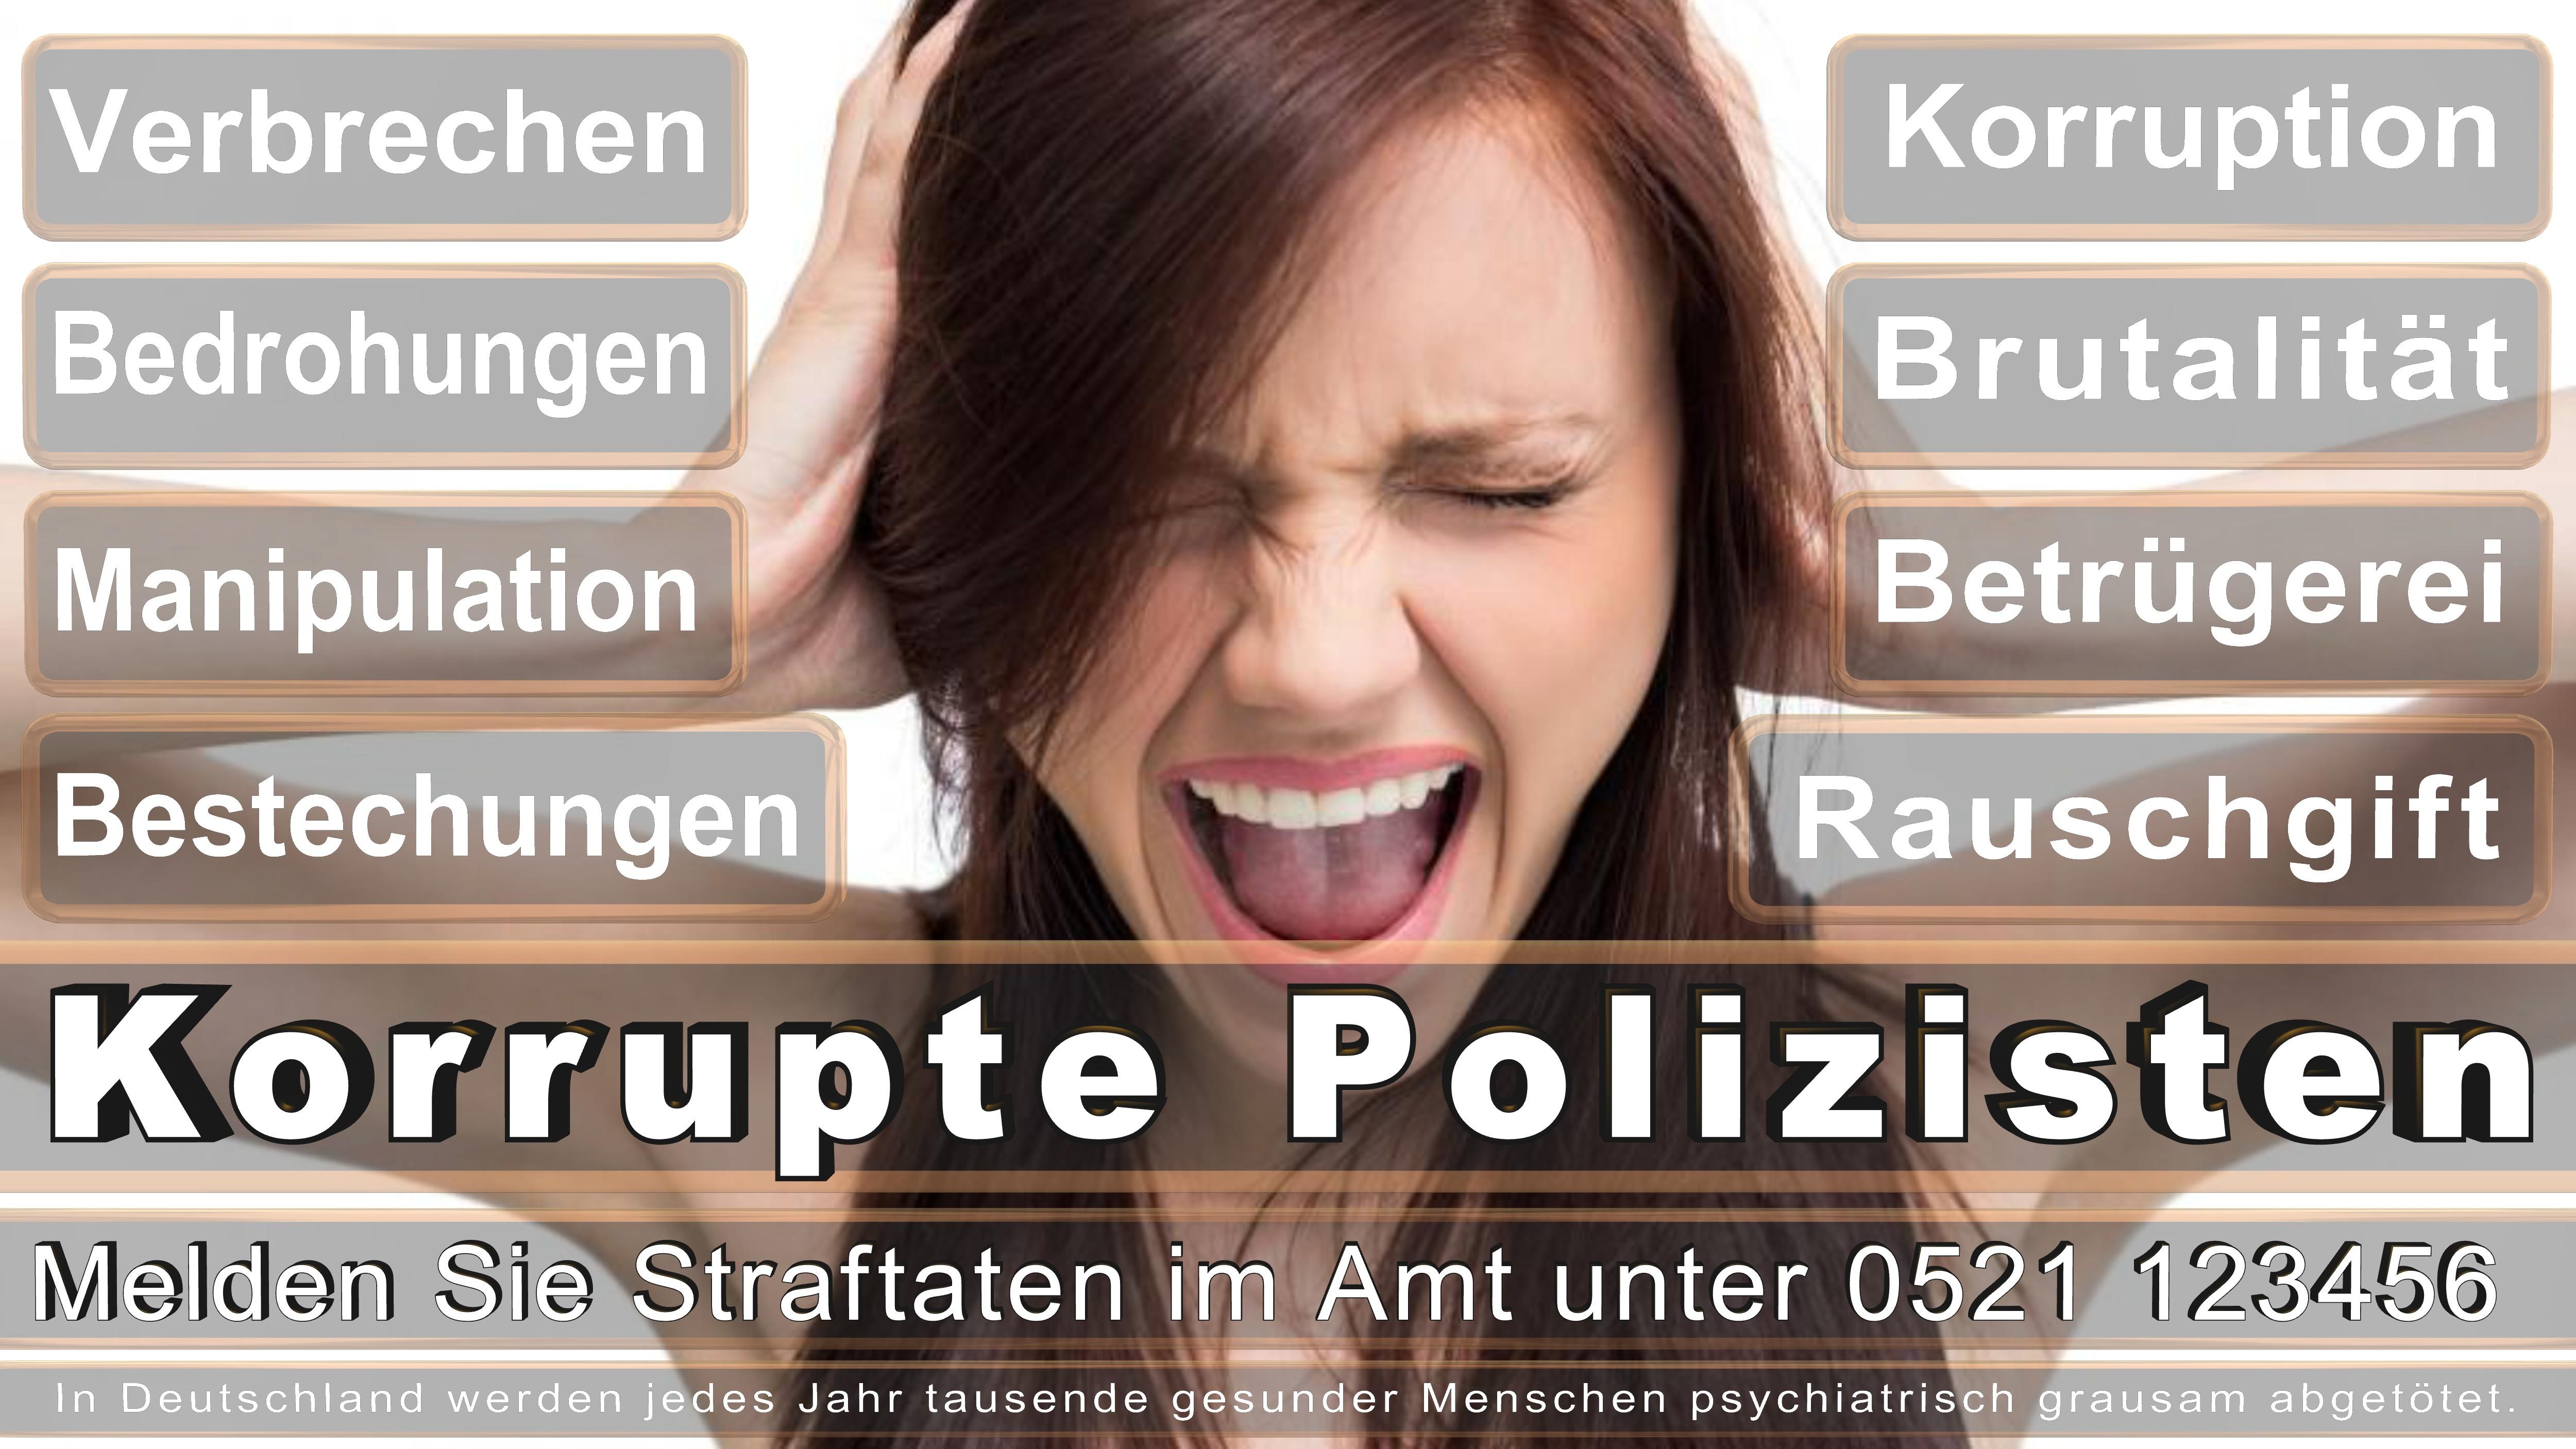 Polizei-Bielefeld-Polizei-Bielefeld-Polizei-Bielefeld (176)